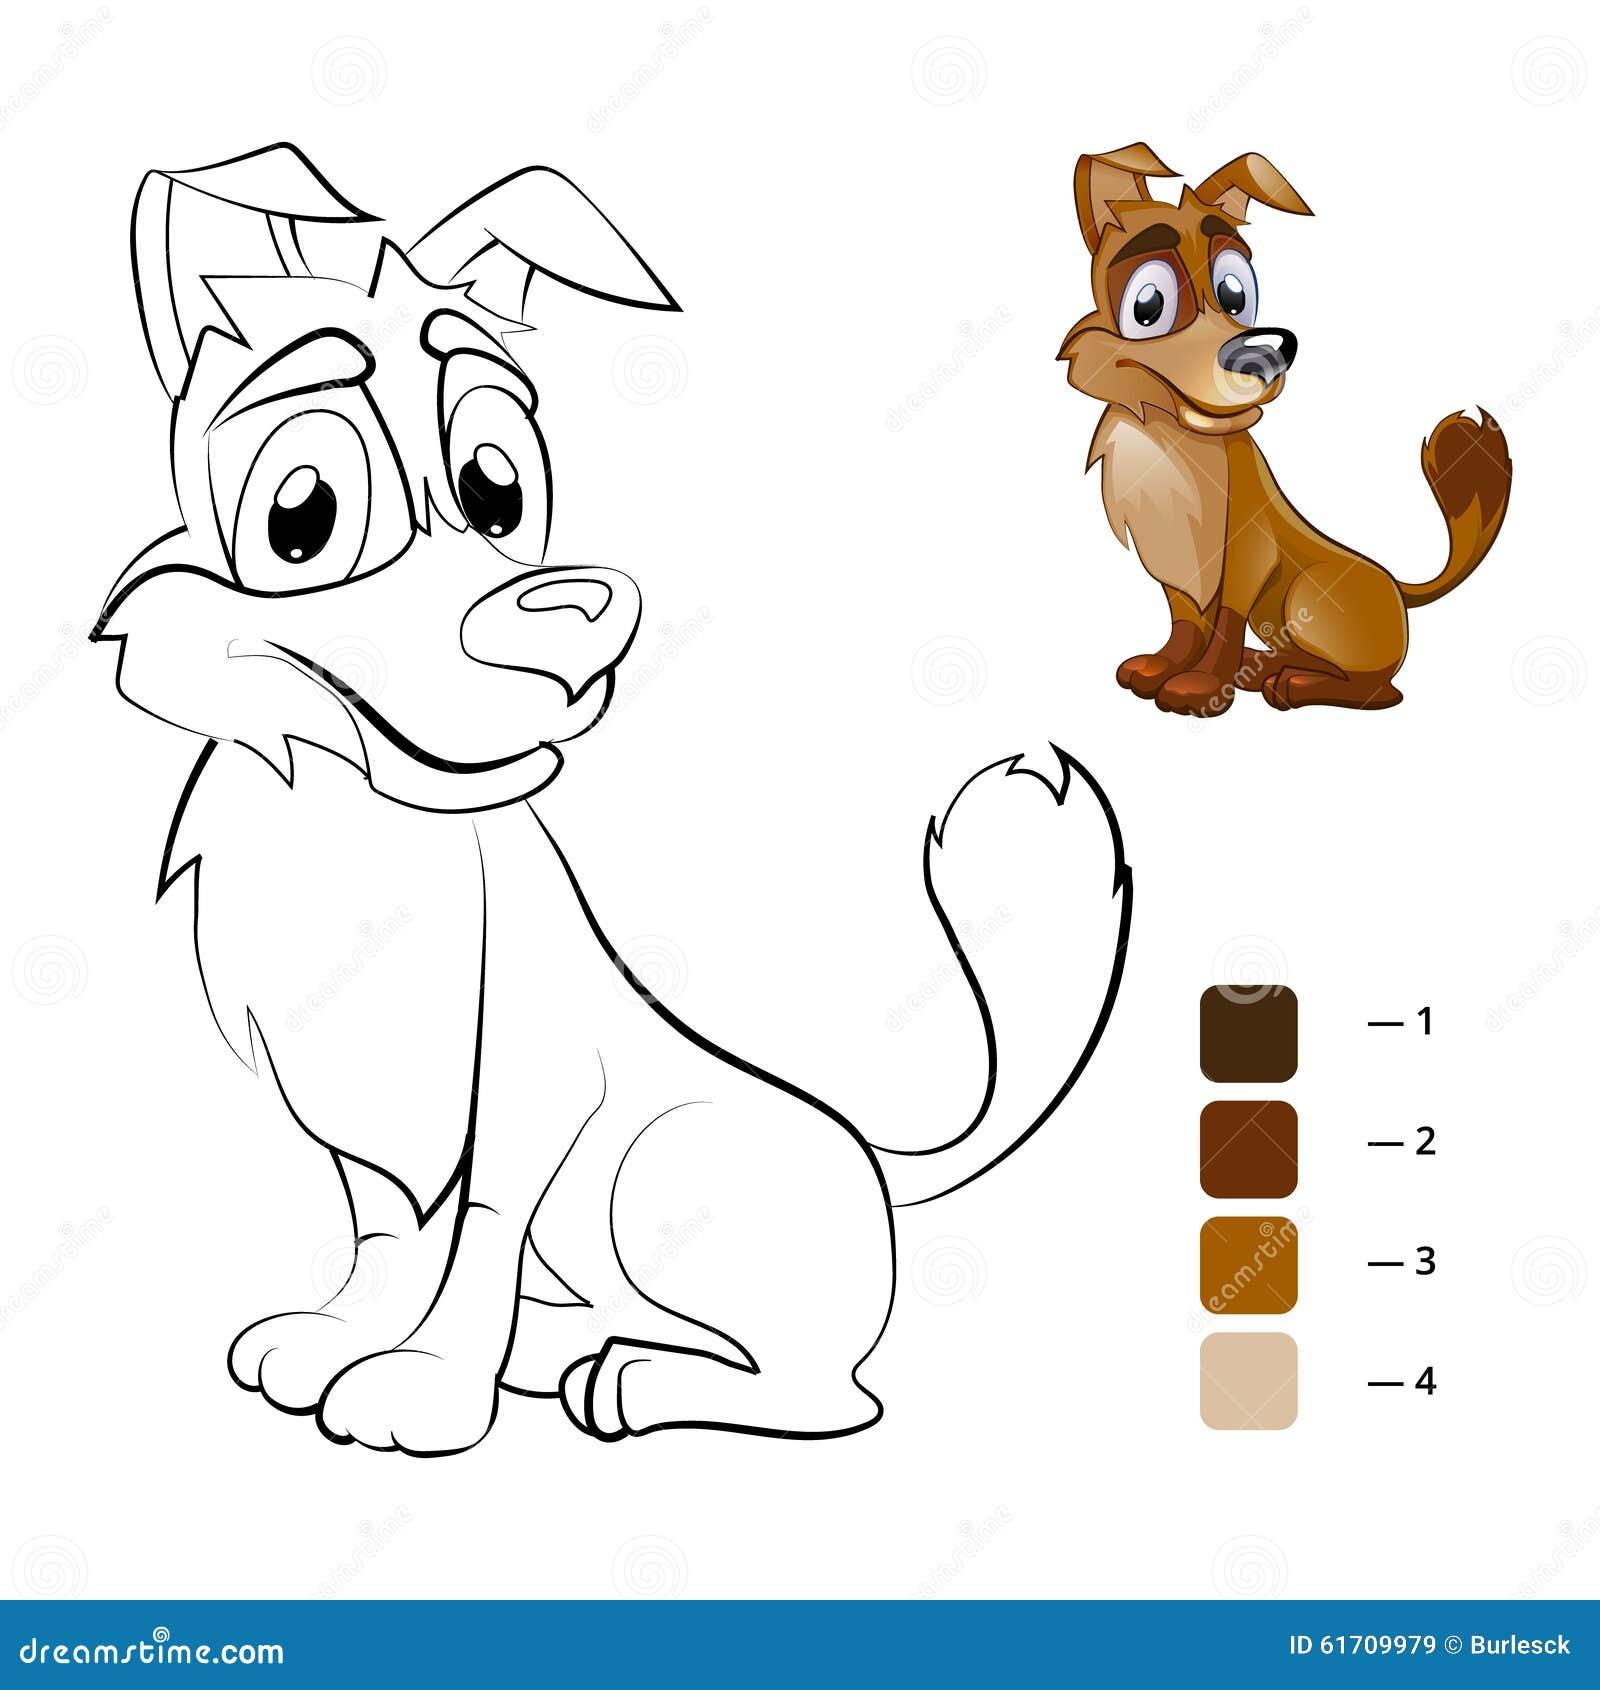 Color Dog Coloring Book For Preschool Children Stock Vector